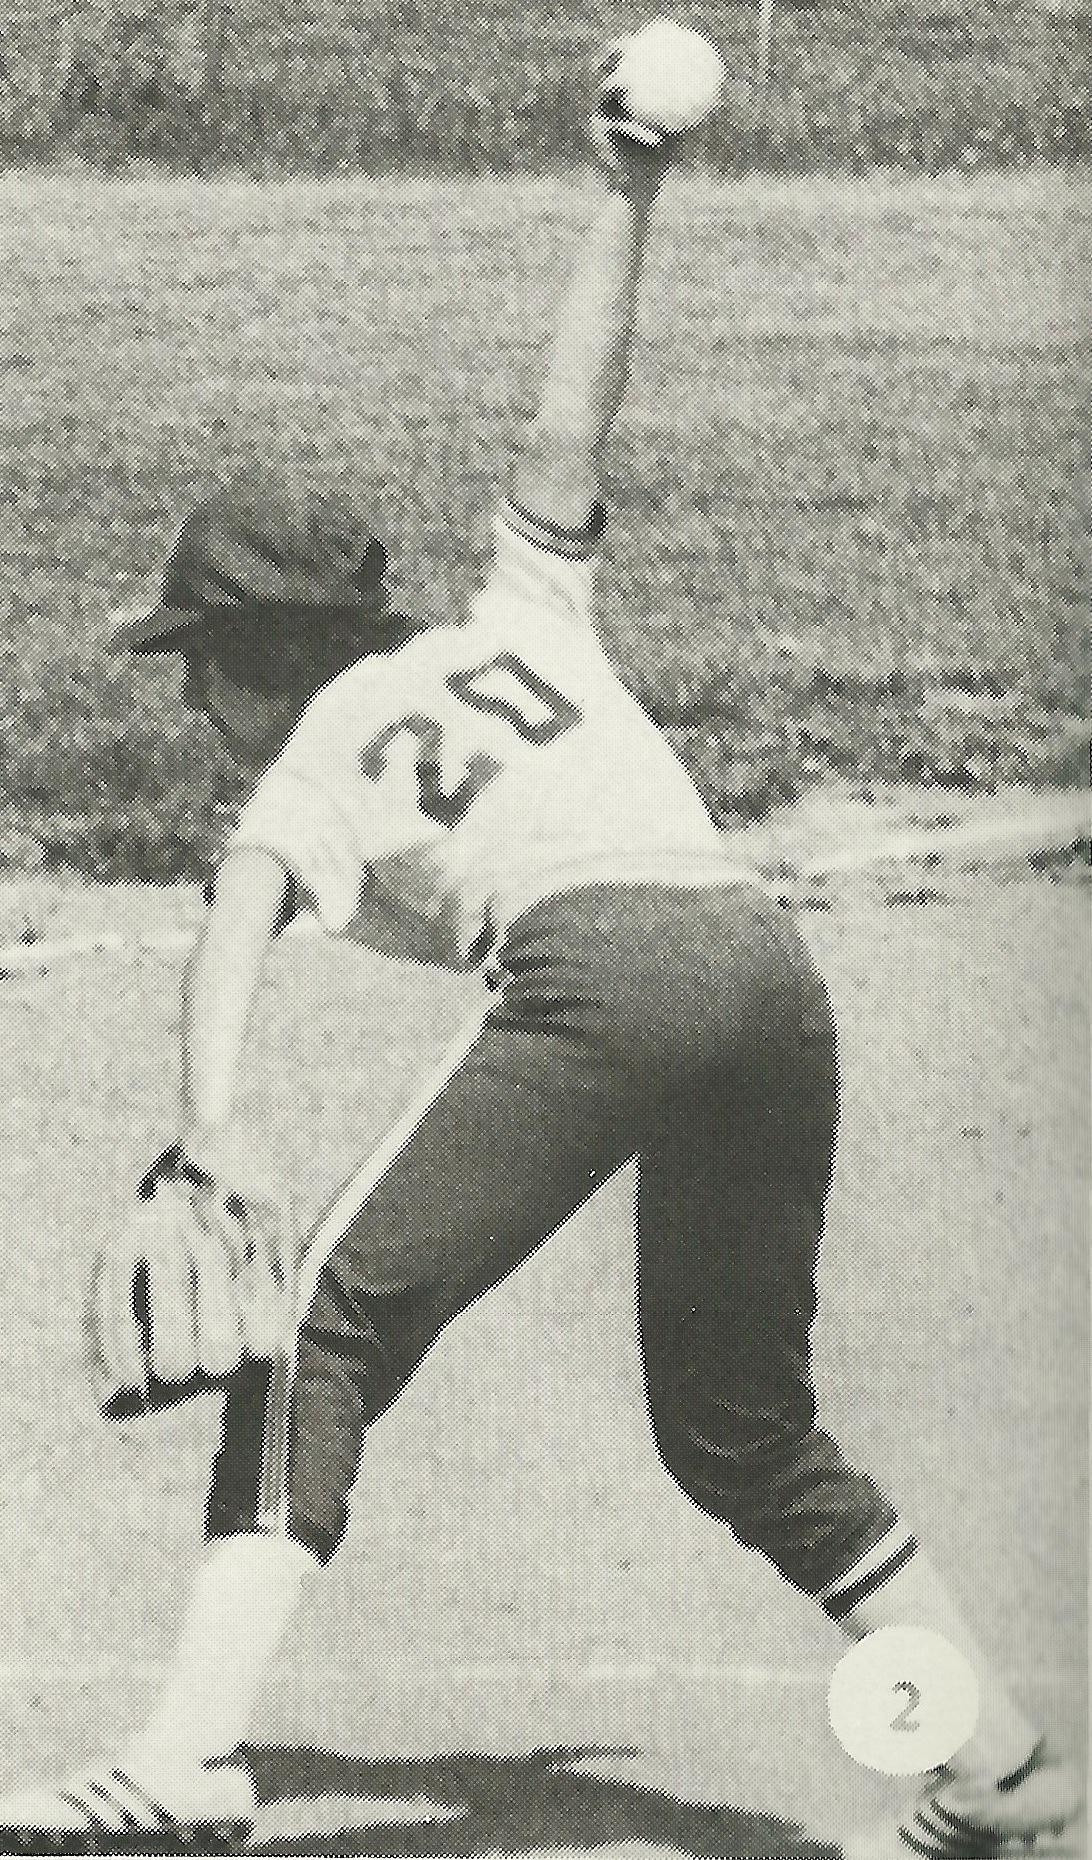 1982 Softball - Lori Francescon.jpeg